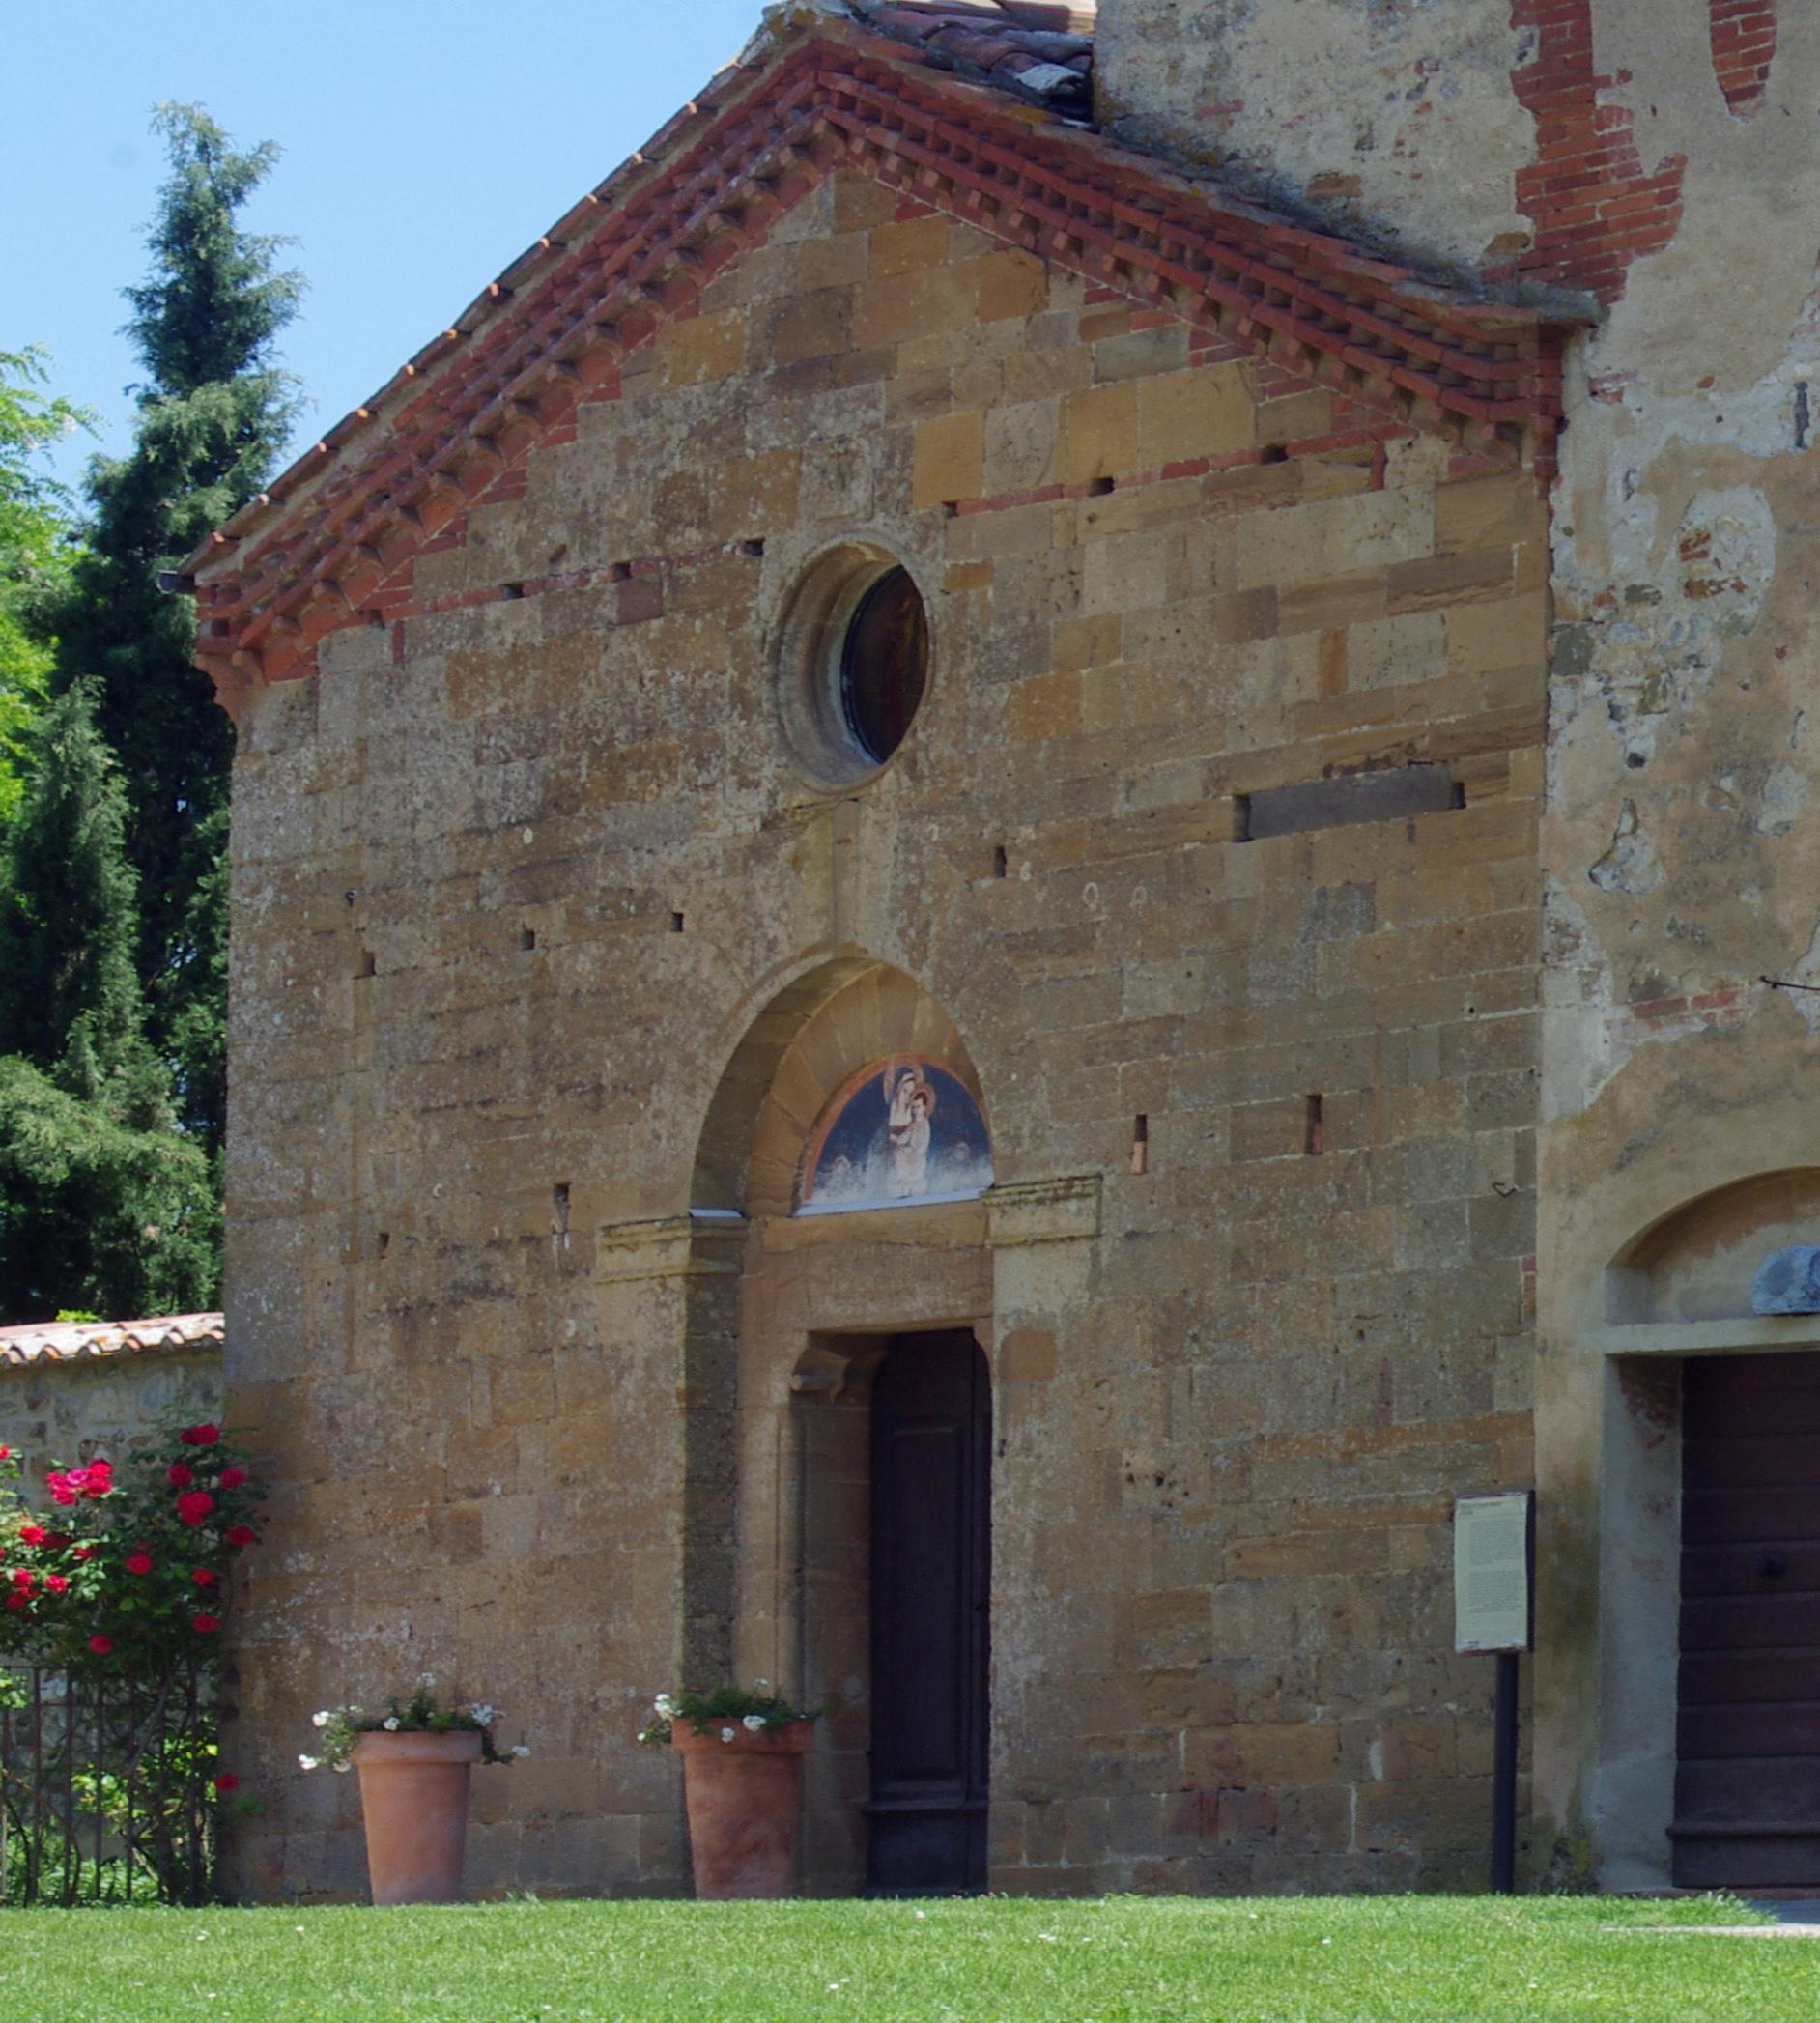 Chiesa di Santa Maria a Sicille, Trequanda